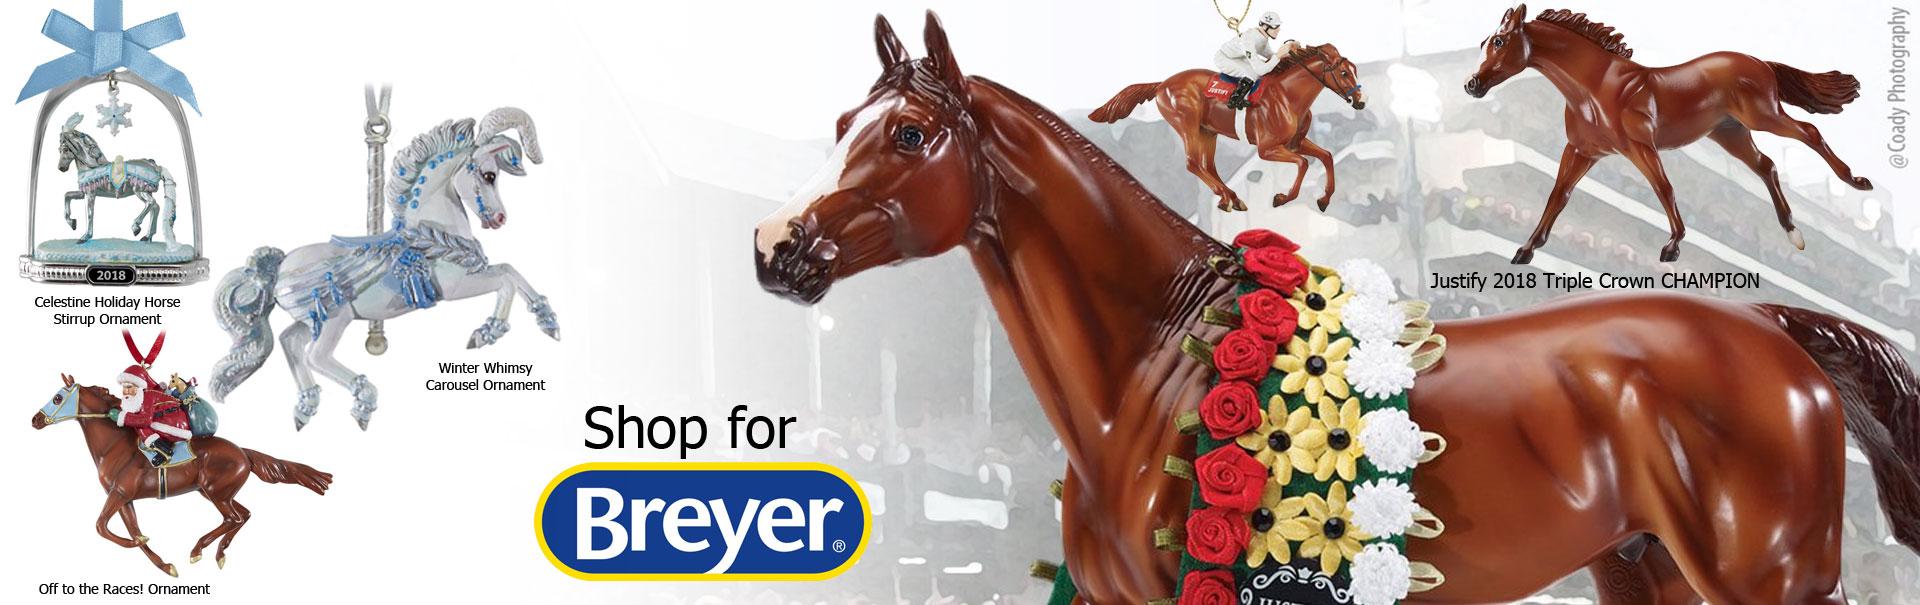 Shop Breyer